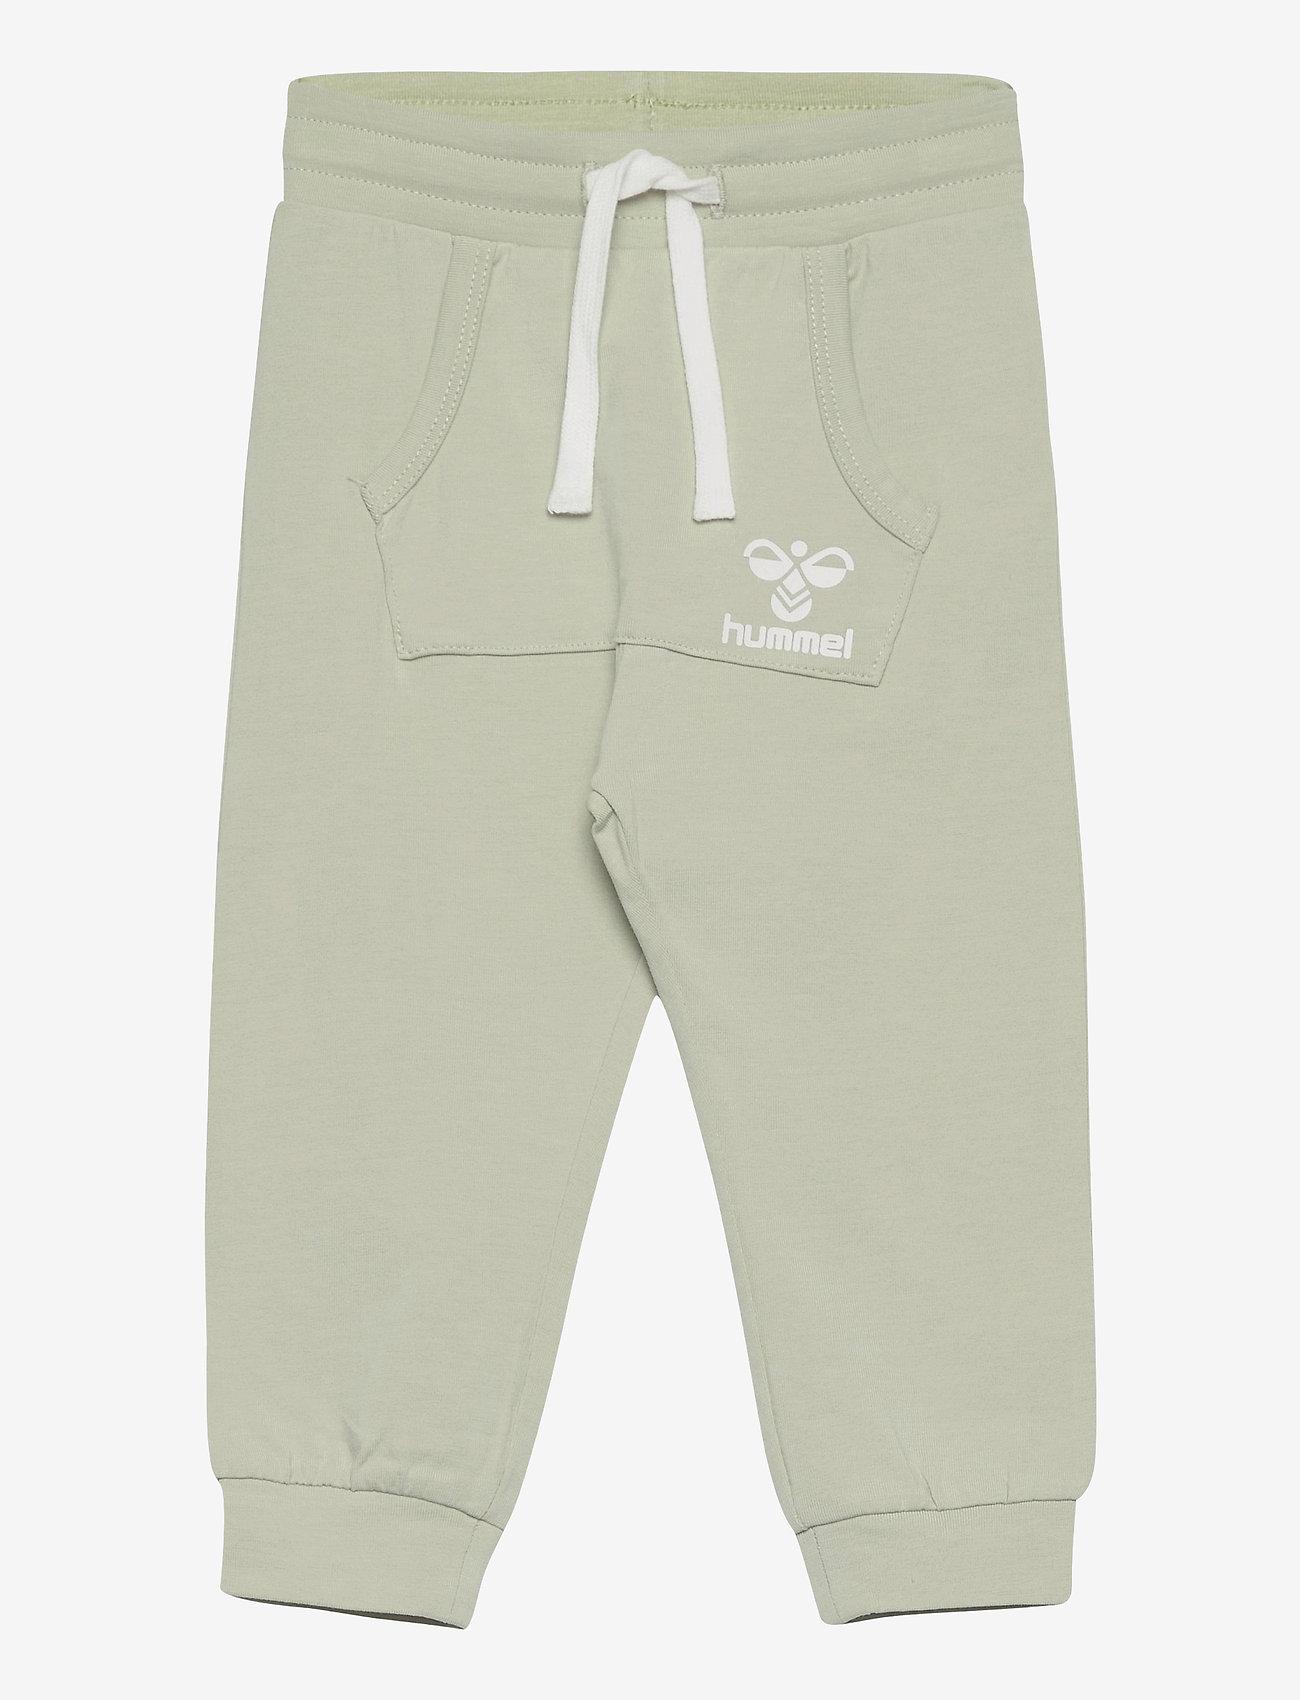 Hummel - hmlFUTTE PANTS - sweatpants - desert sage - 0